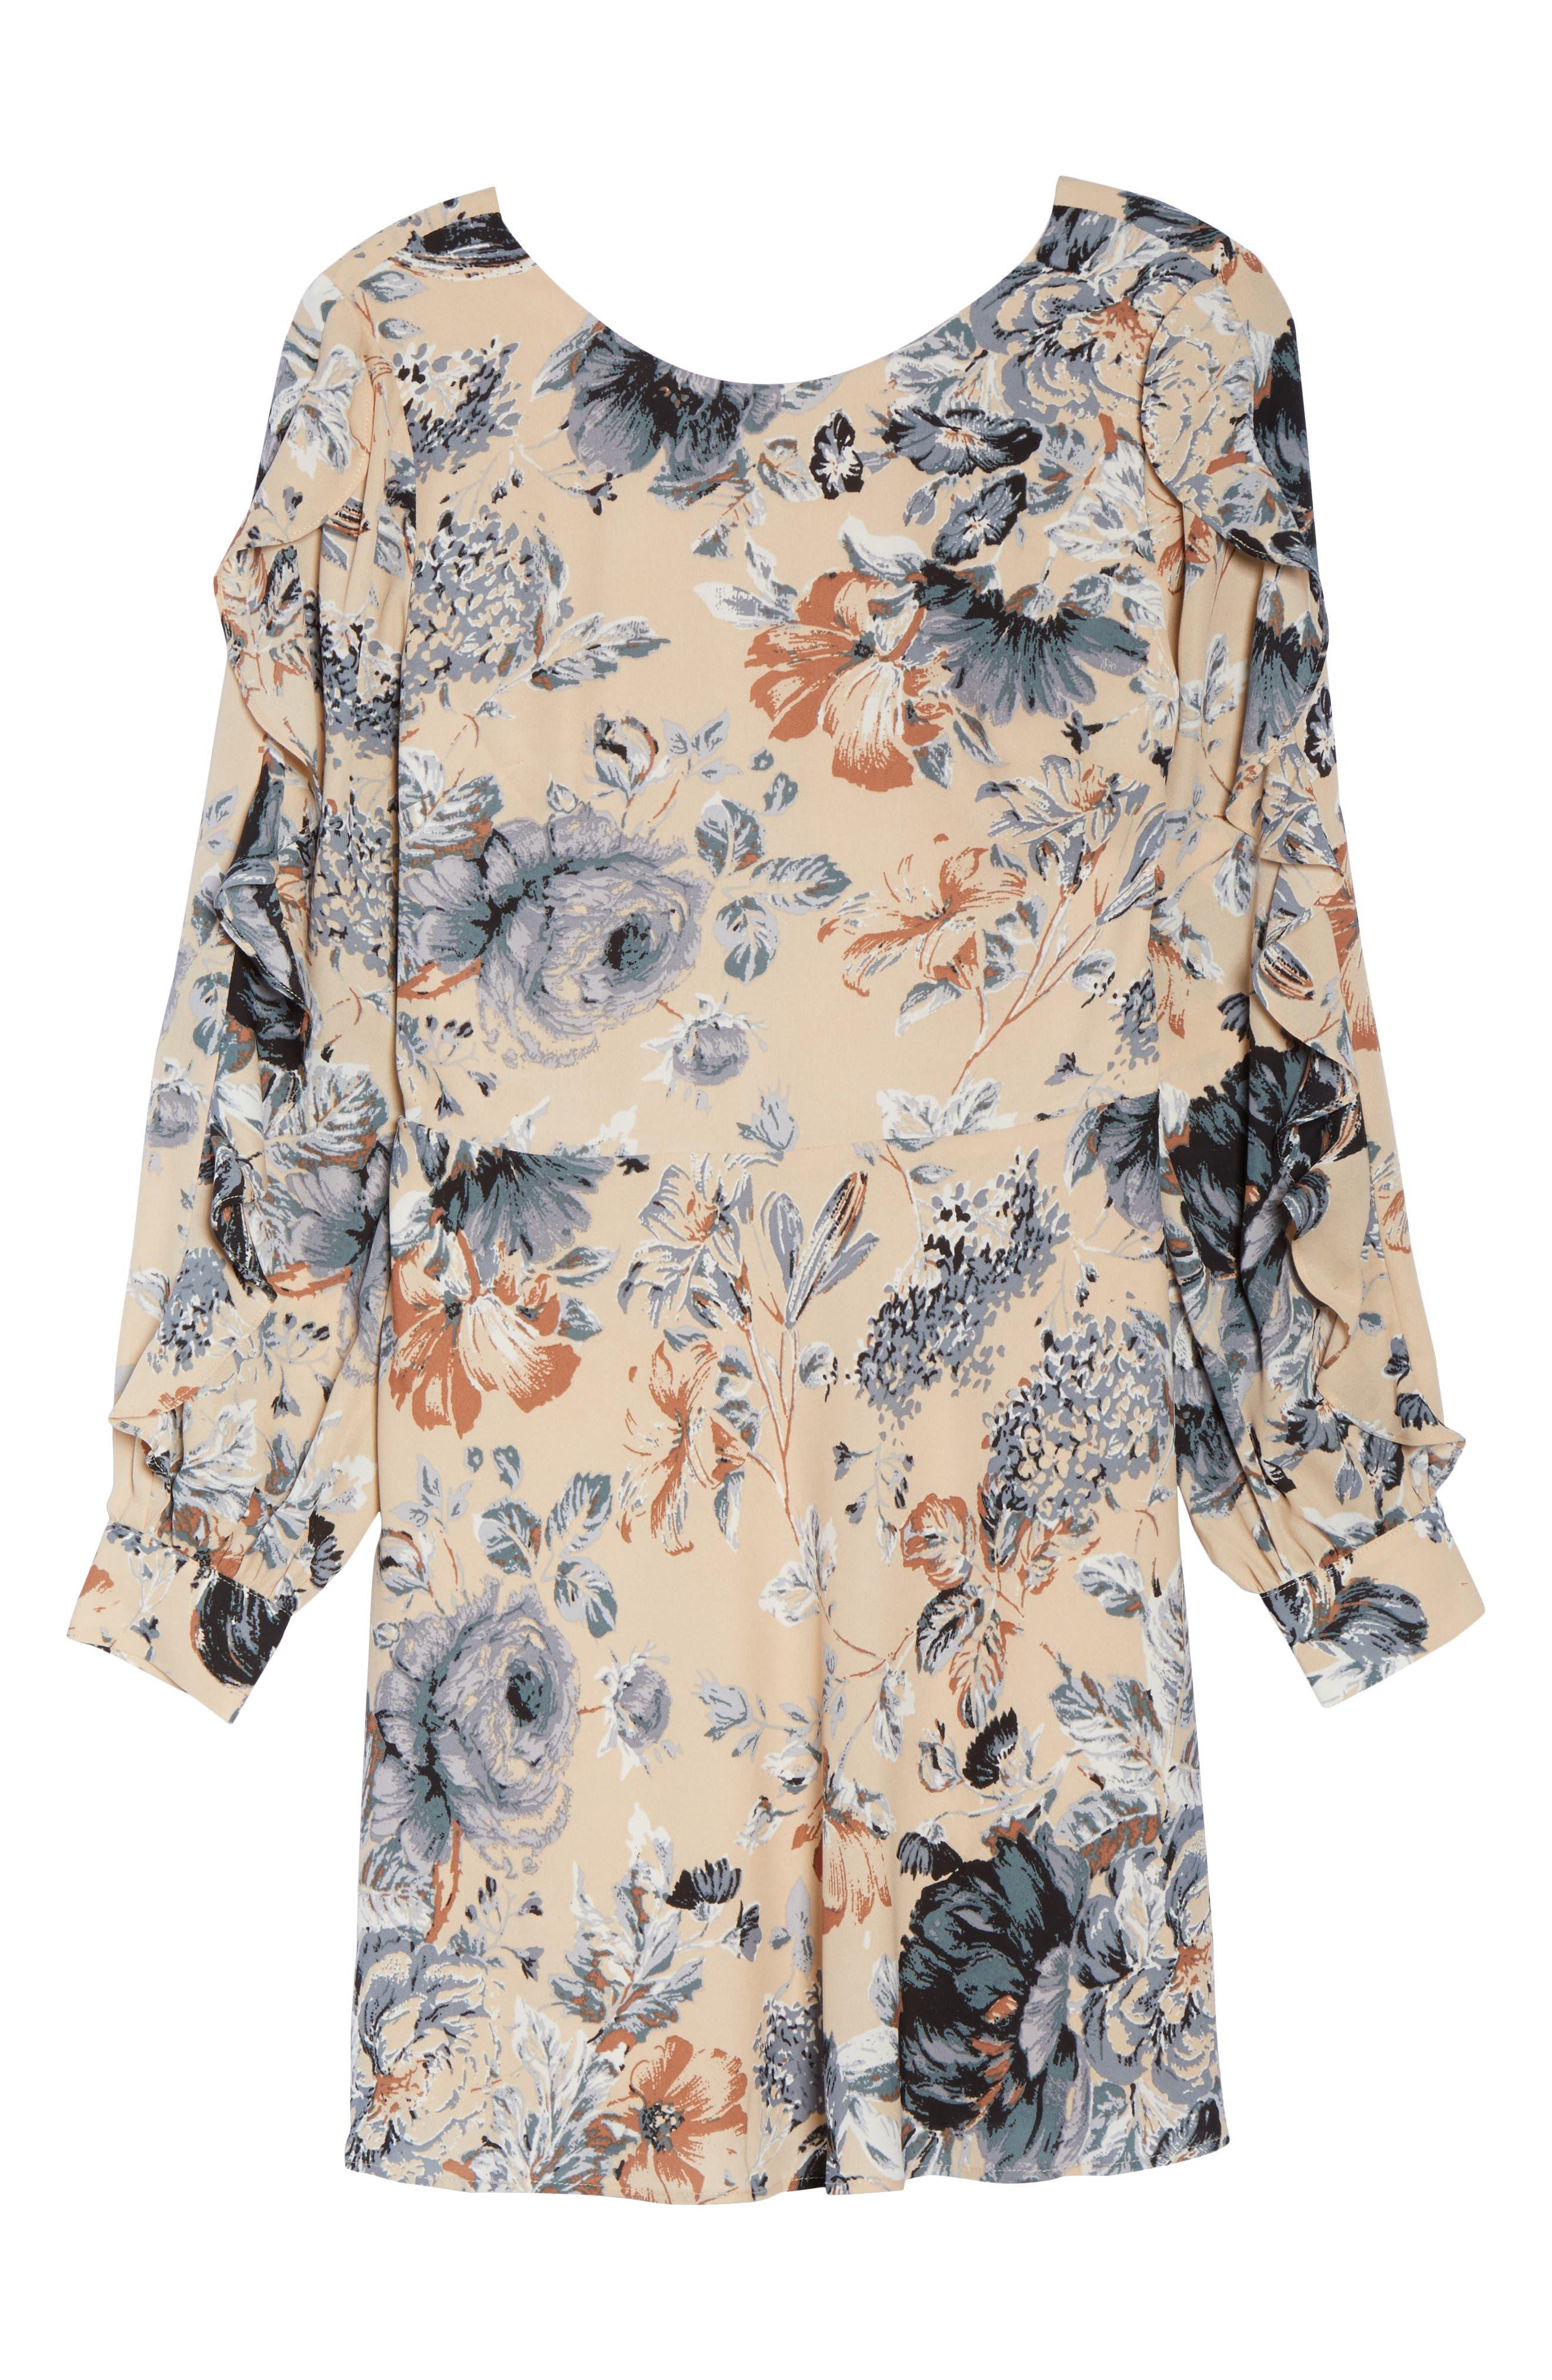 Merci Floral Fit & Flare Dress,                             Alternate thumbnail 6, color,                             264